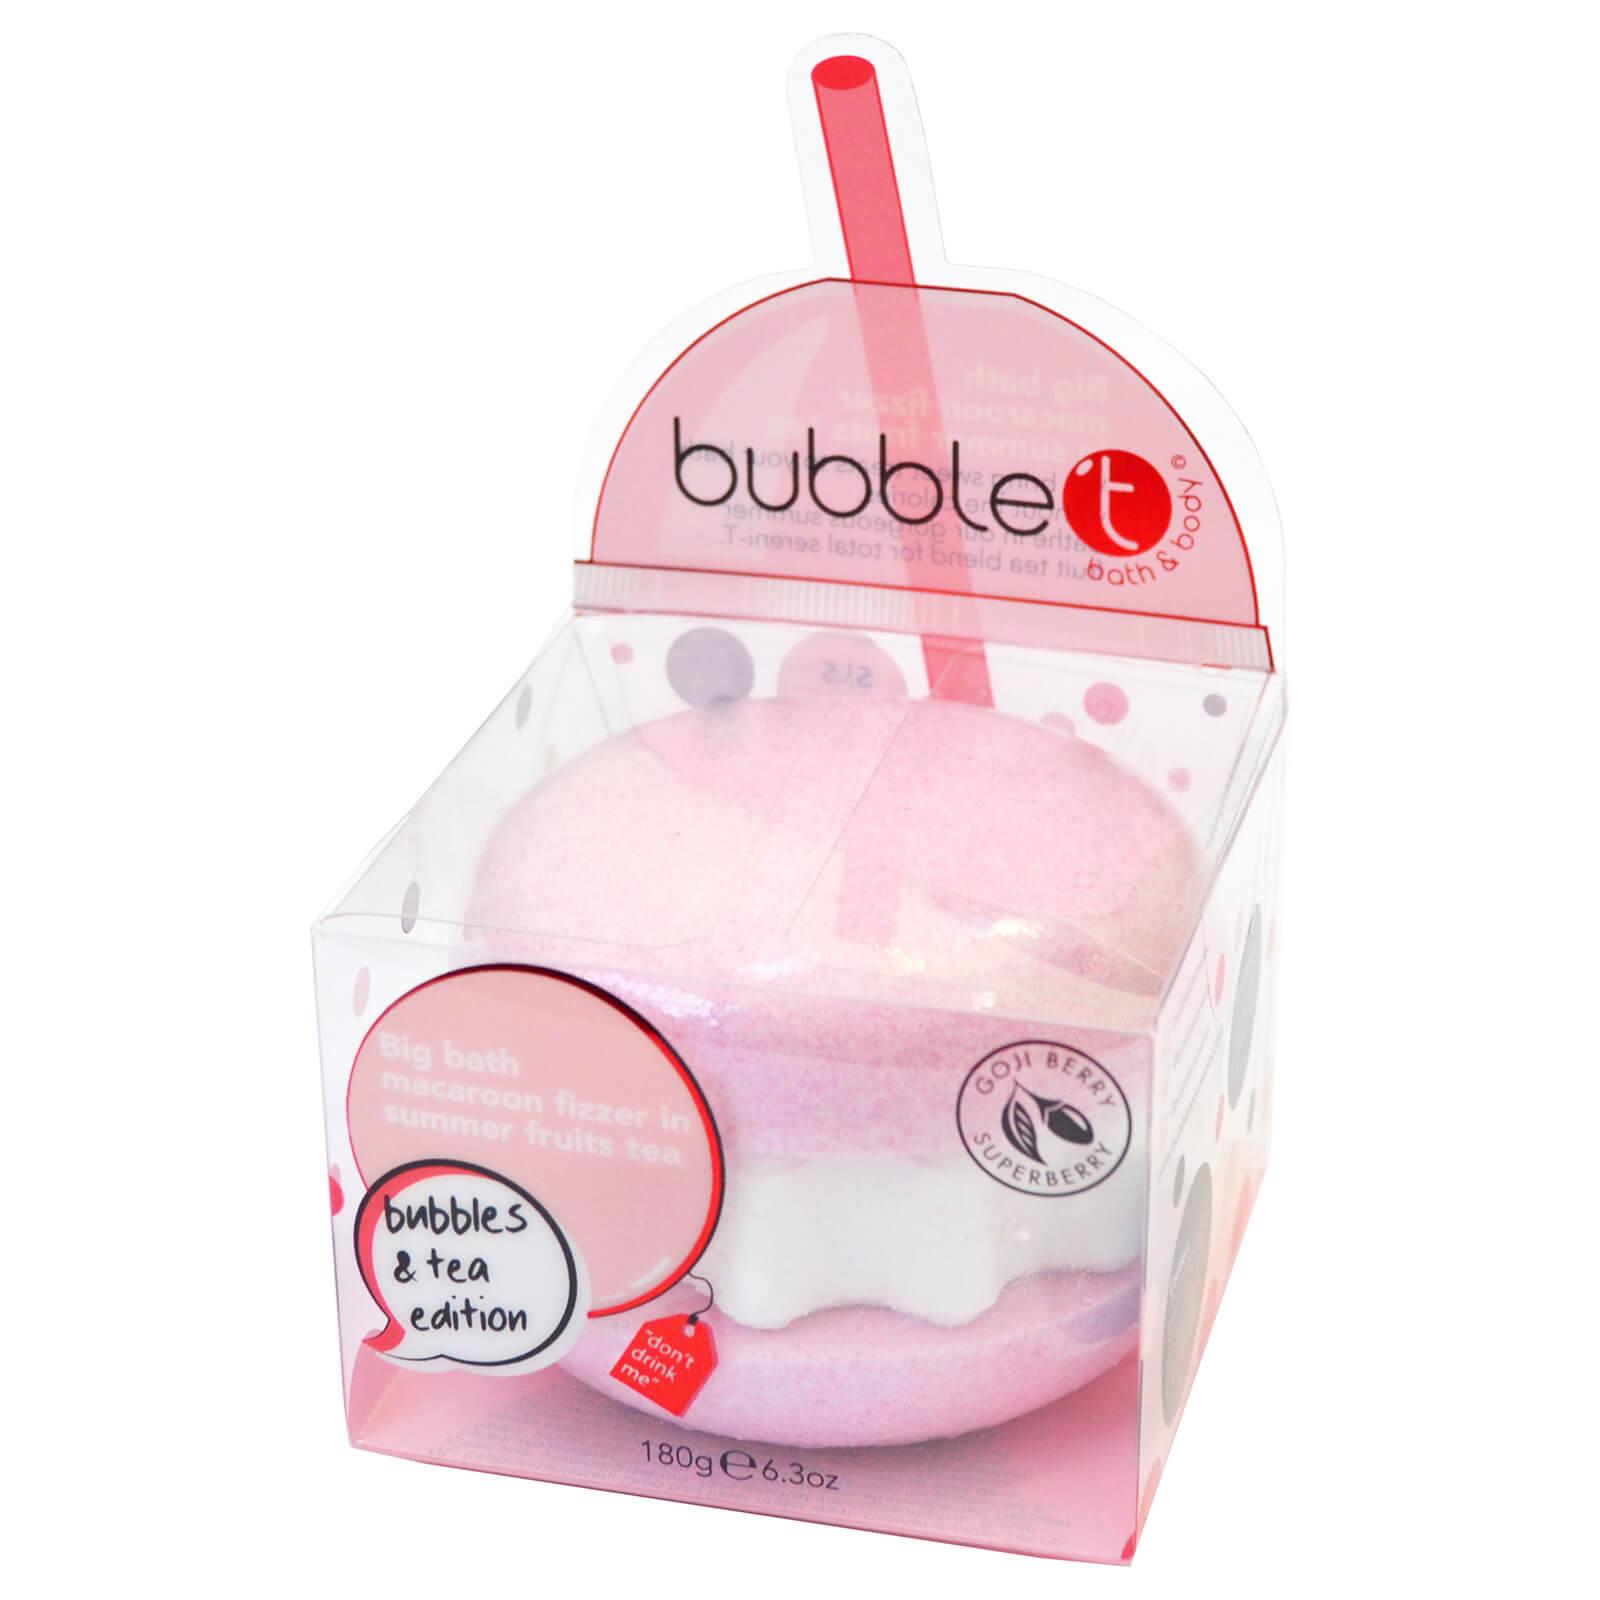 Купить Bubble T Summer Fruits Tea Giant Bath Bomb Fizzer (180g)